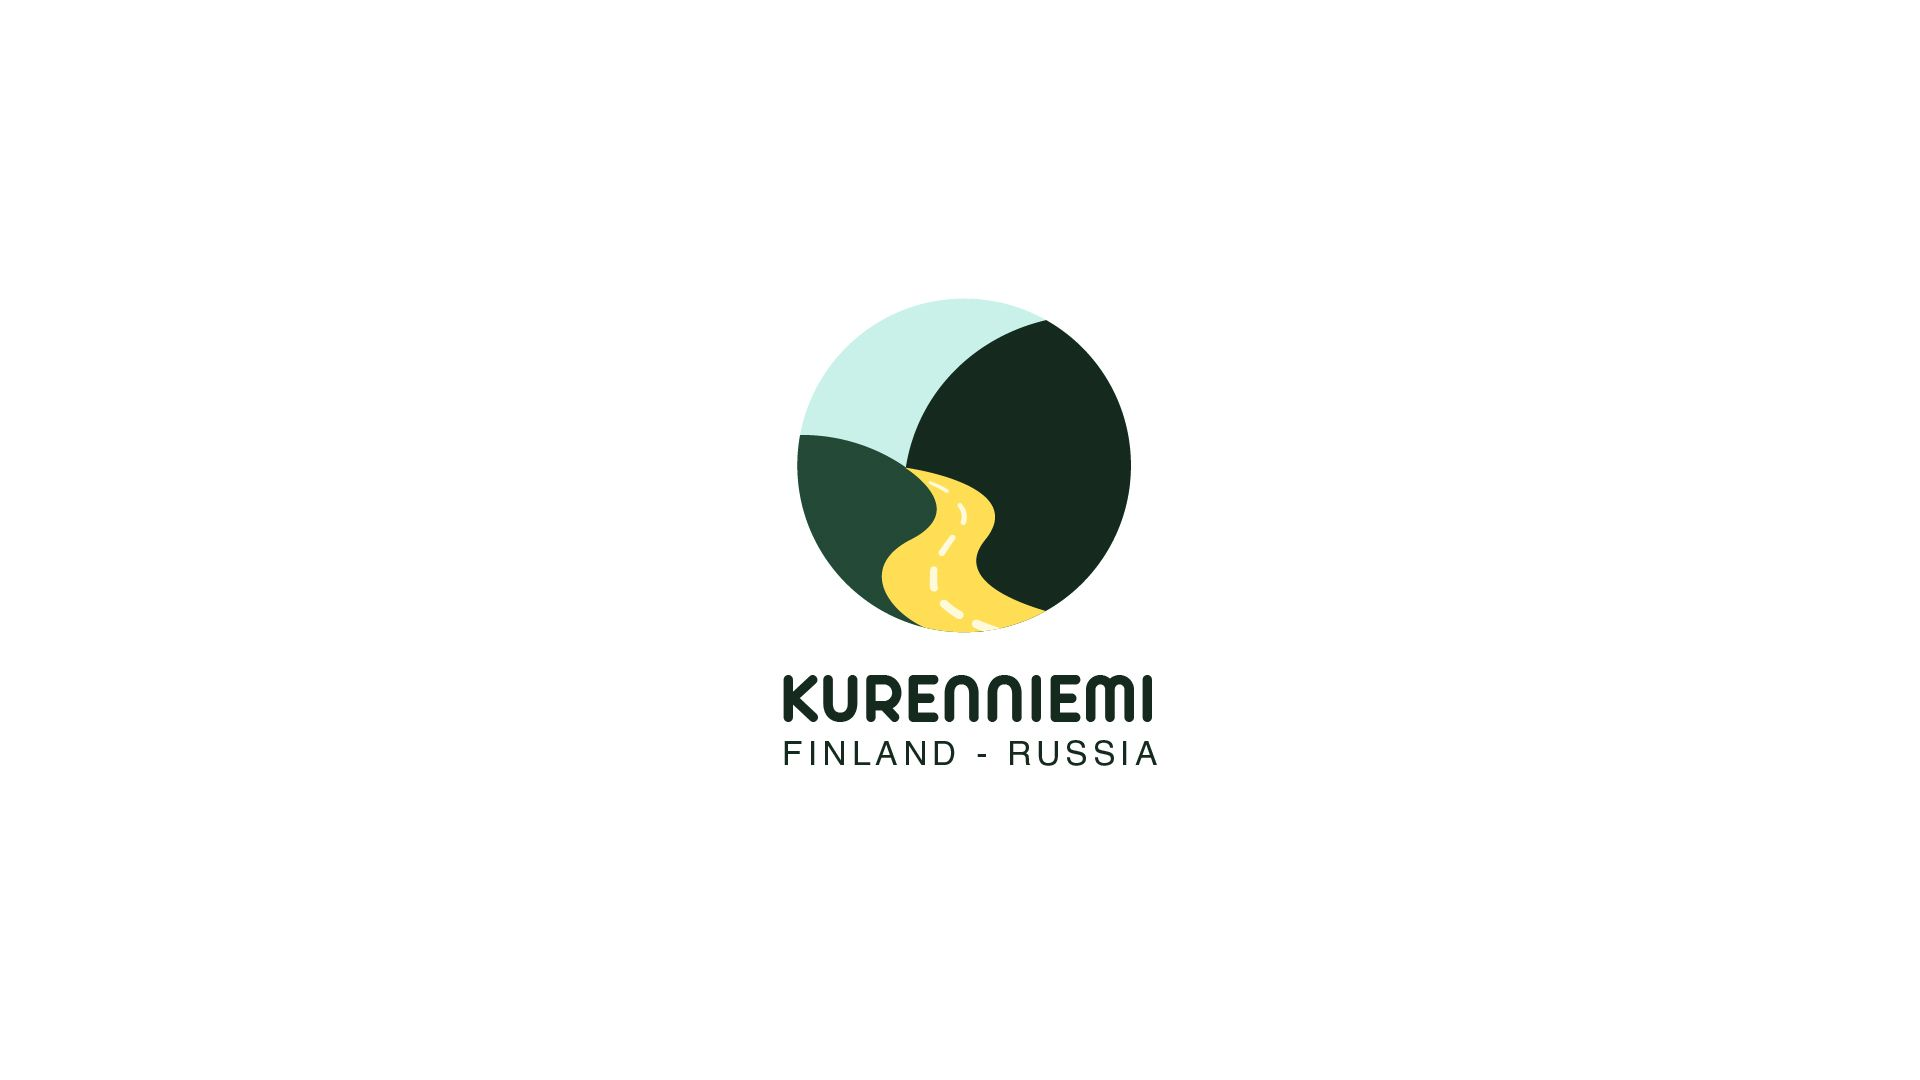 Логотип для Kurenniemi, FinAgRu-nat, Finland-Russia - дизайнер jana39